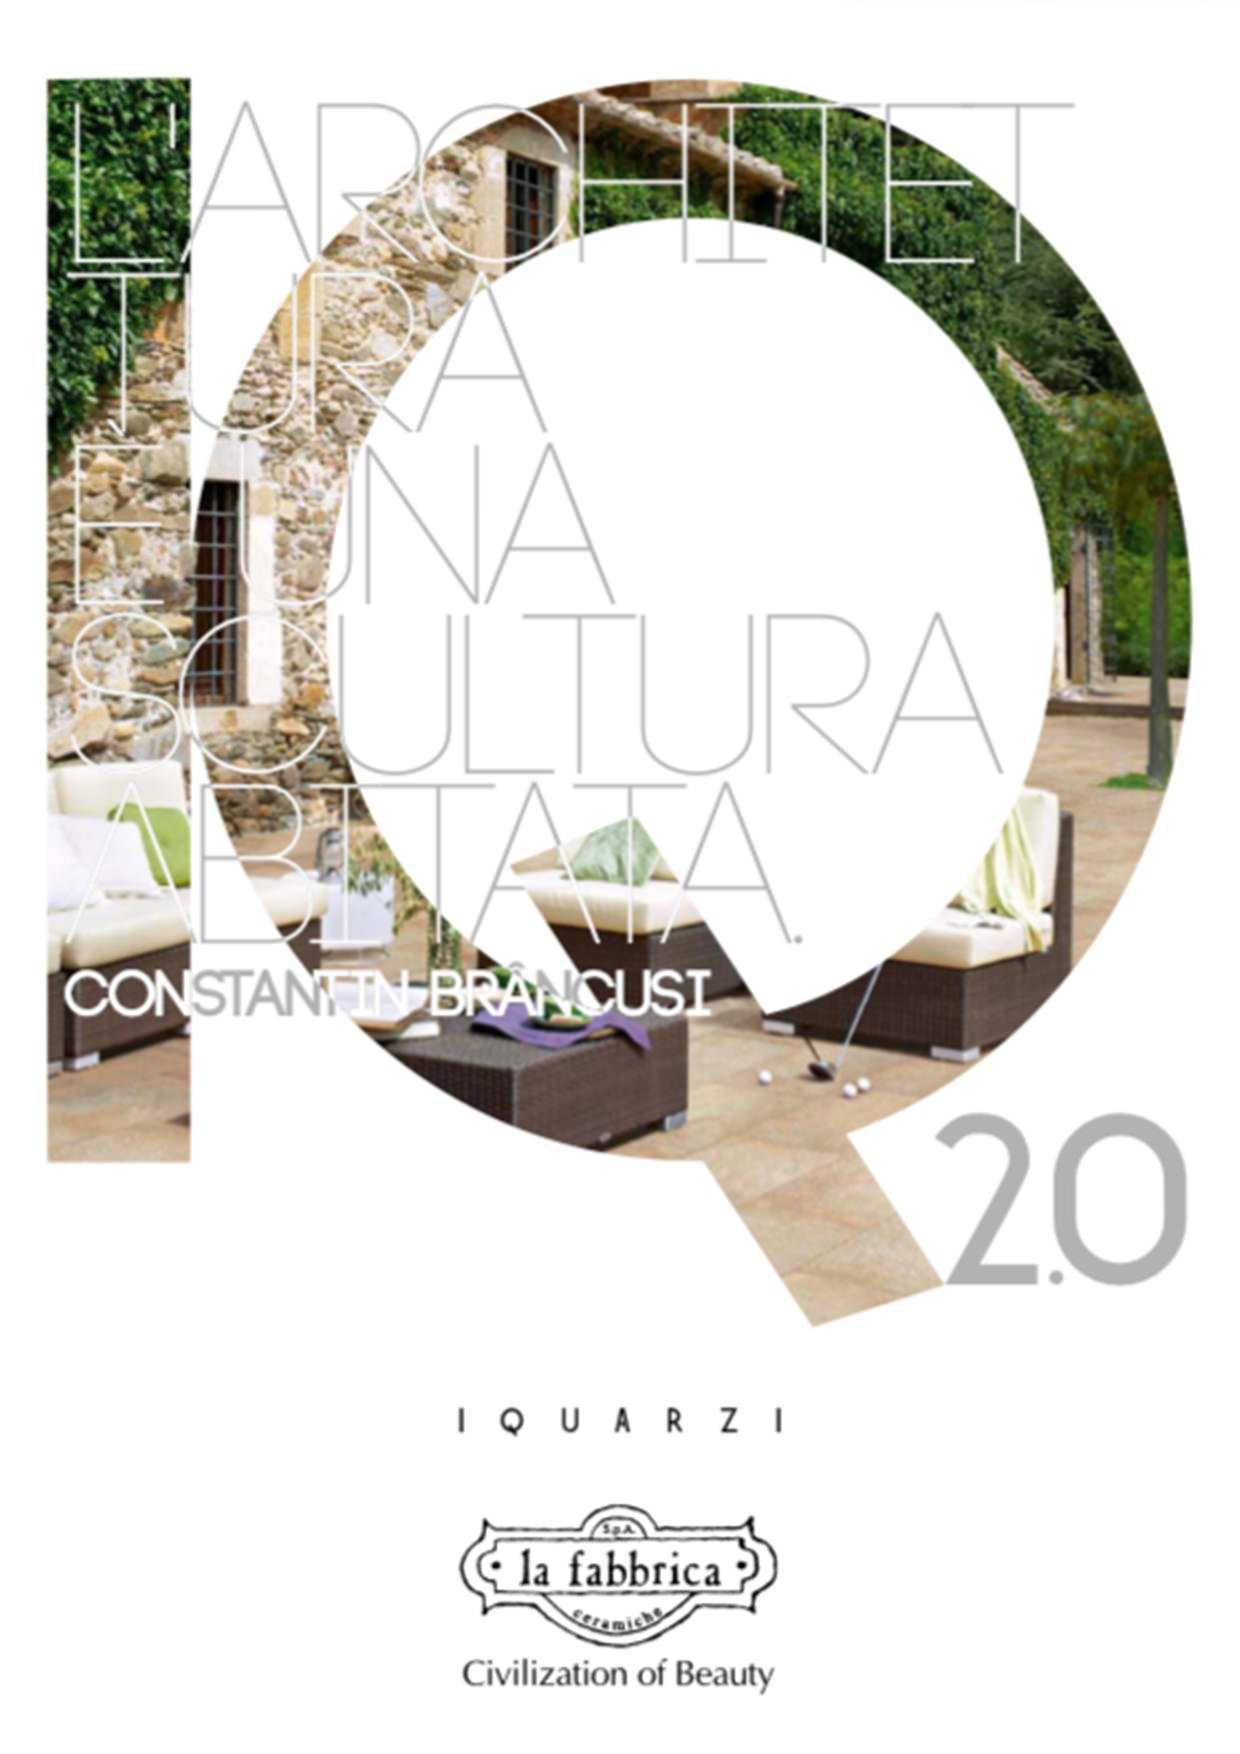 La Fabbrica Catalogo I Quarzi 2.0